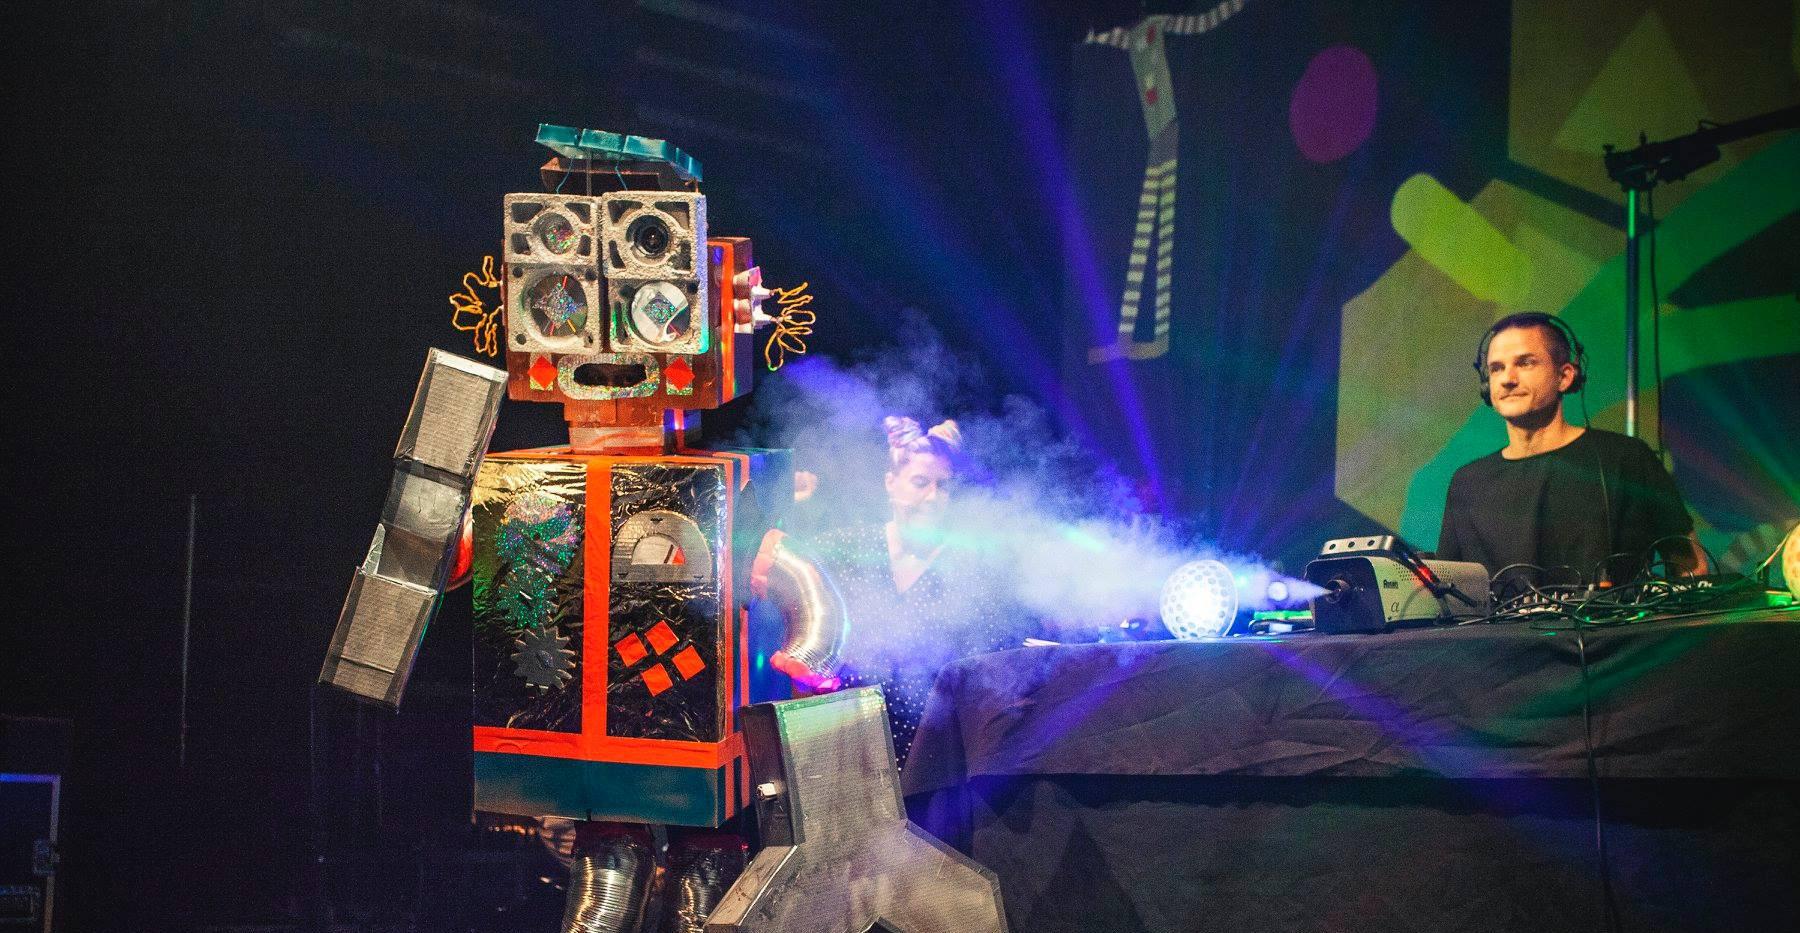 Robot suit for Skidit Festarit